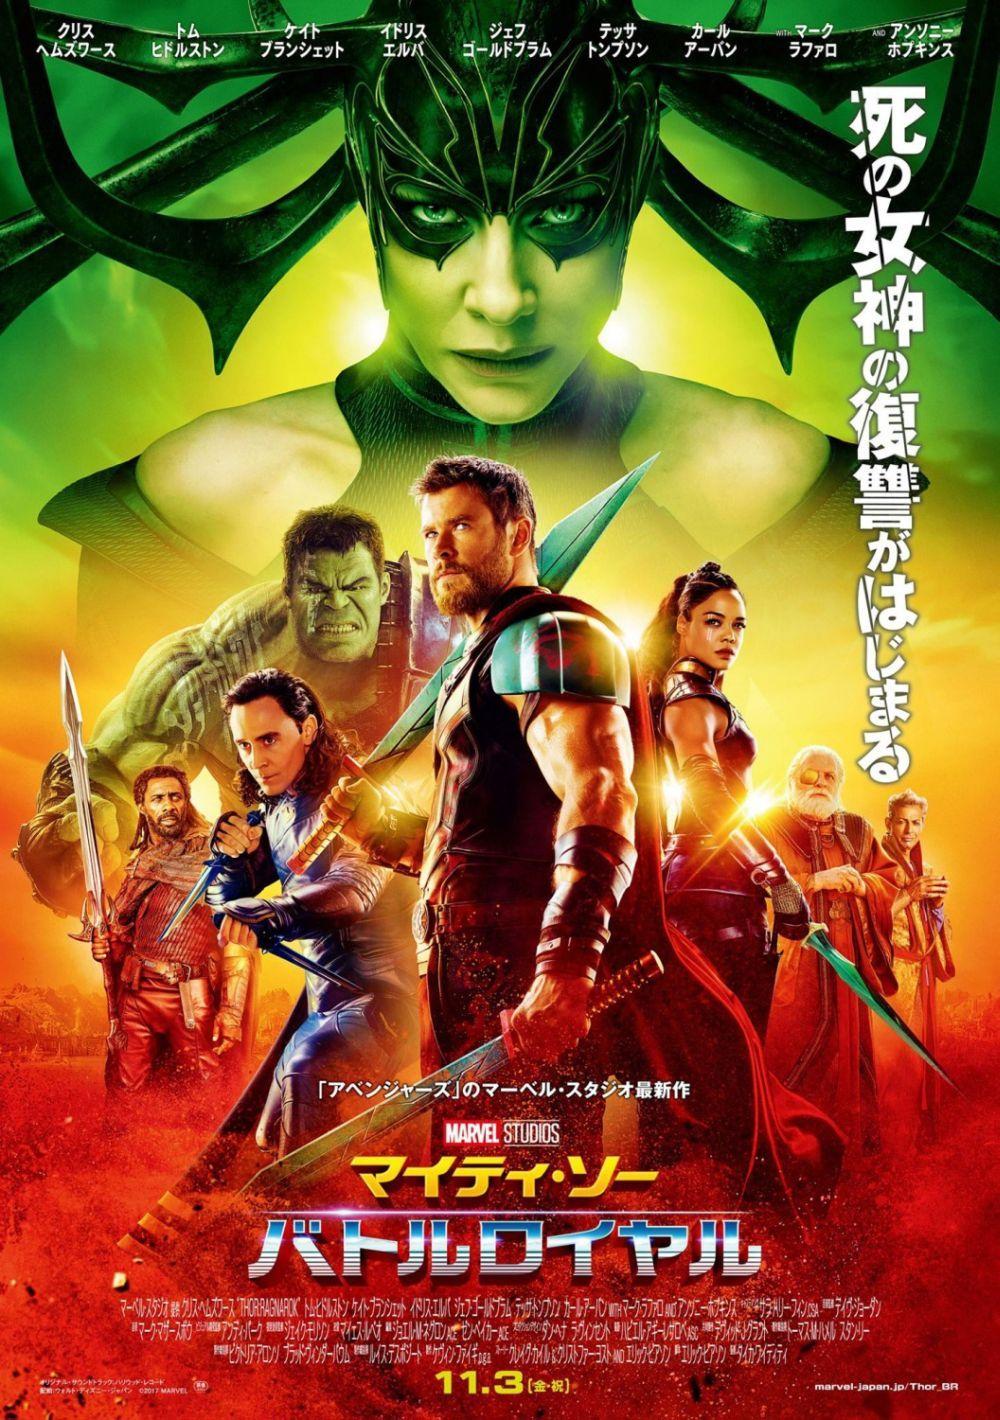 Thor: Ragnarok (2017) Online Free Full English Movie [